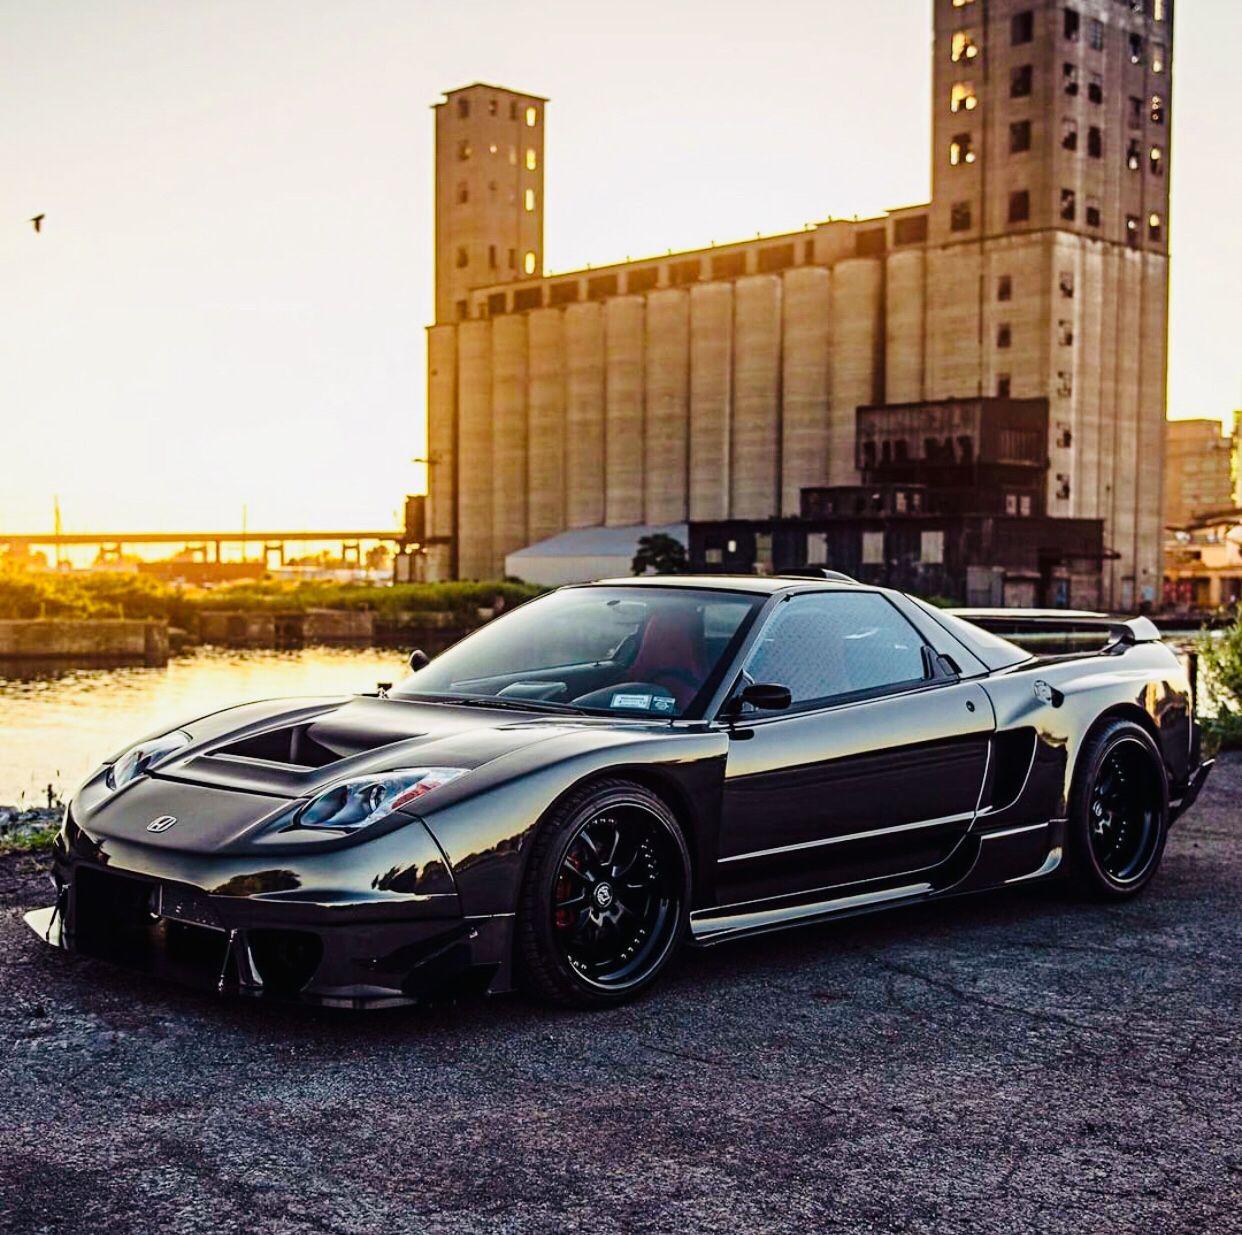 #honda #black #cars #sportscars #supercars #bam #asktr